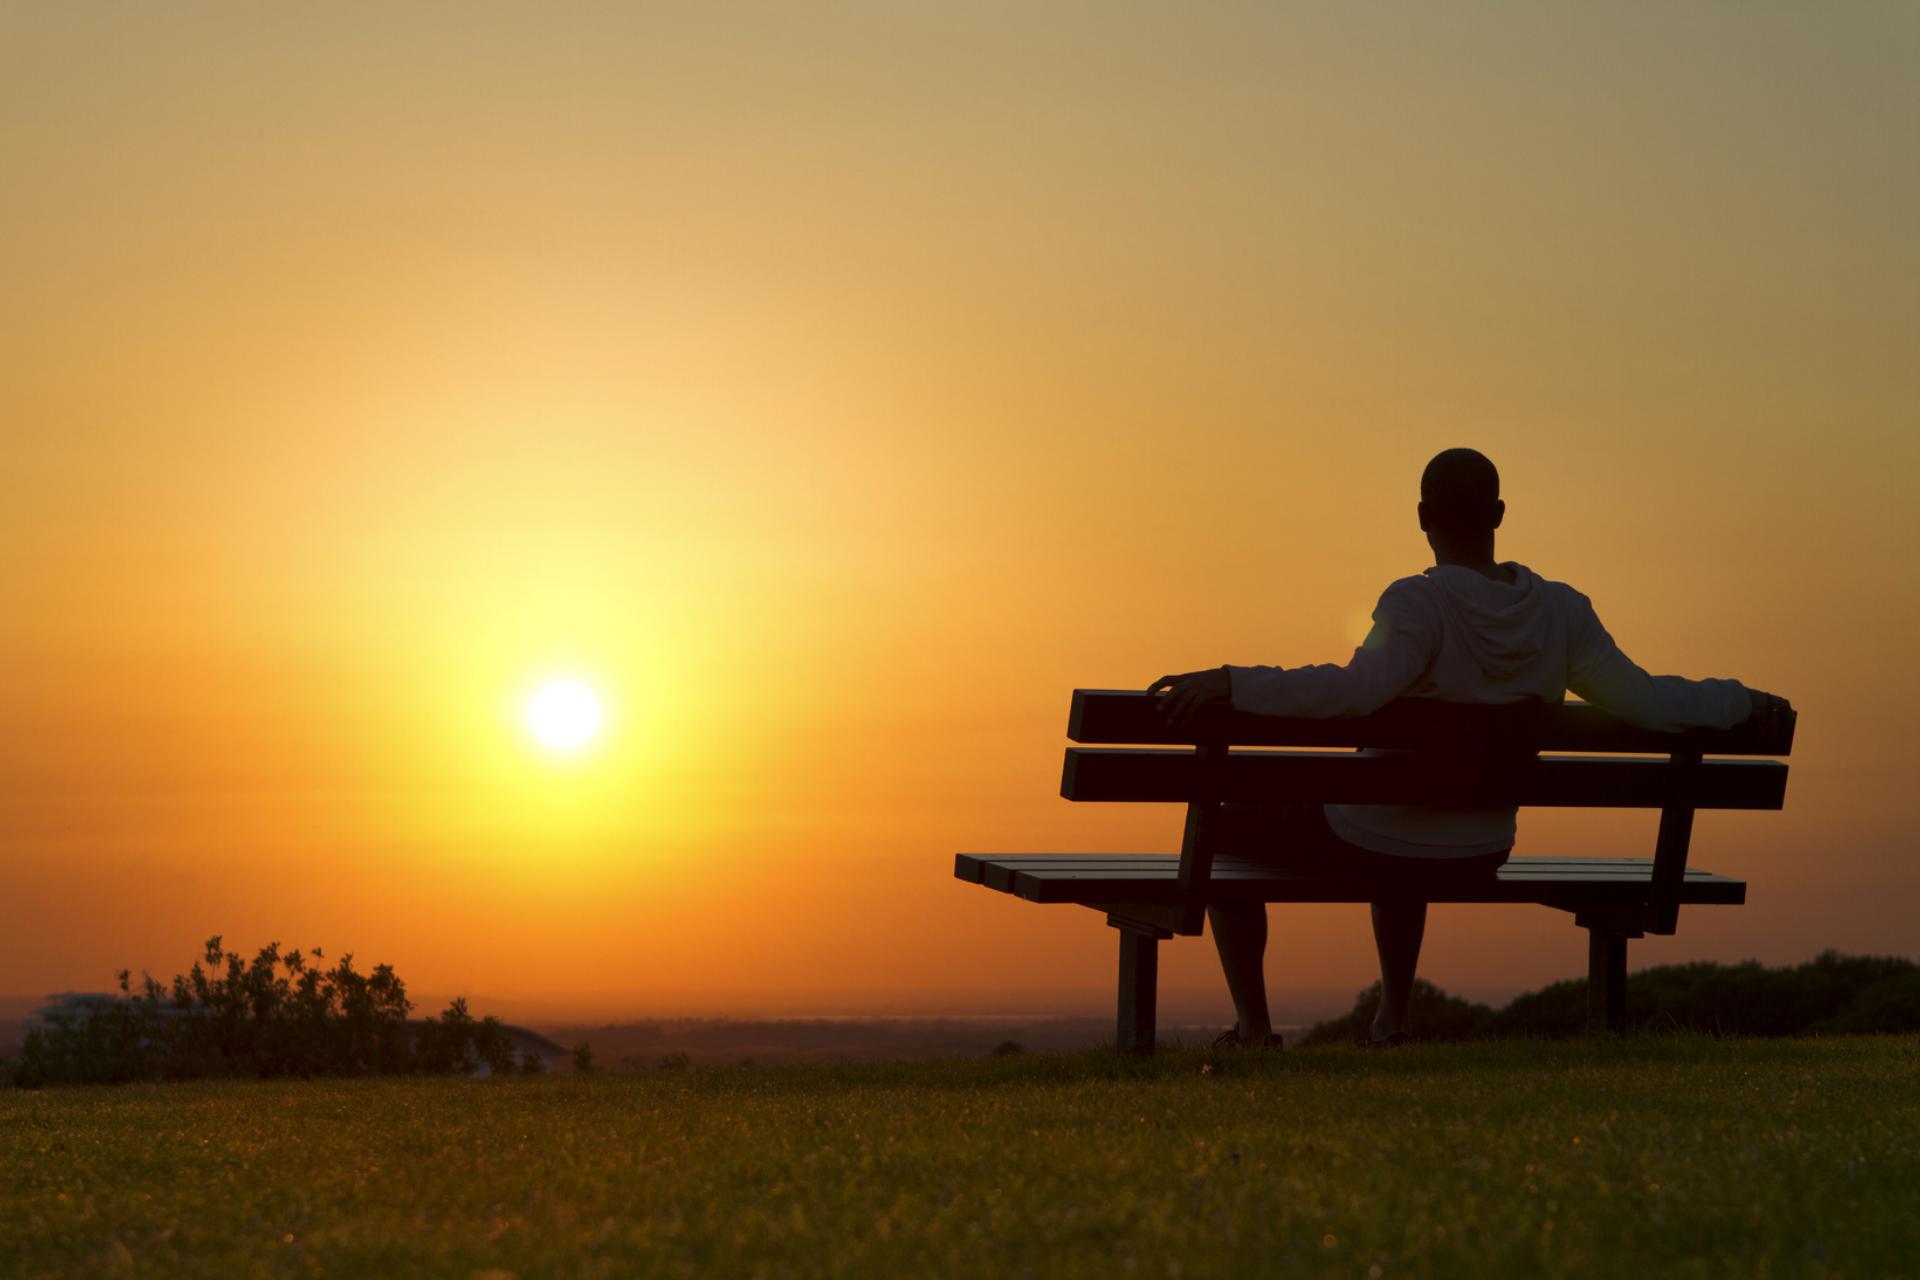 repair your self esteem after a breakup or divorce denver breakup recovery online program